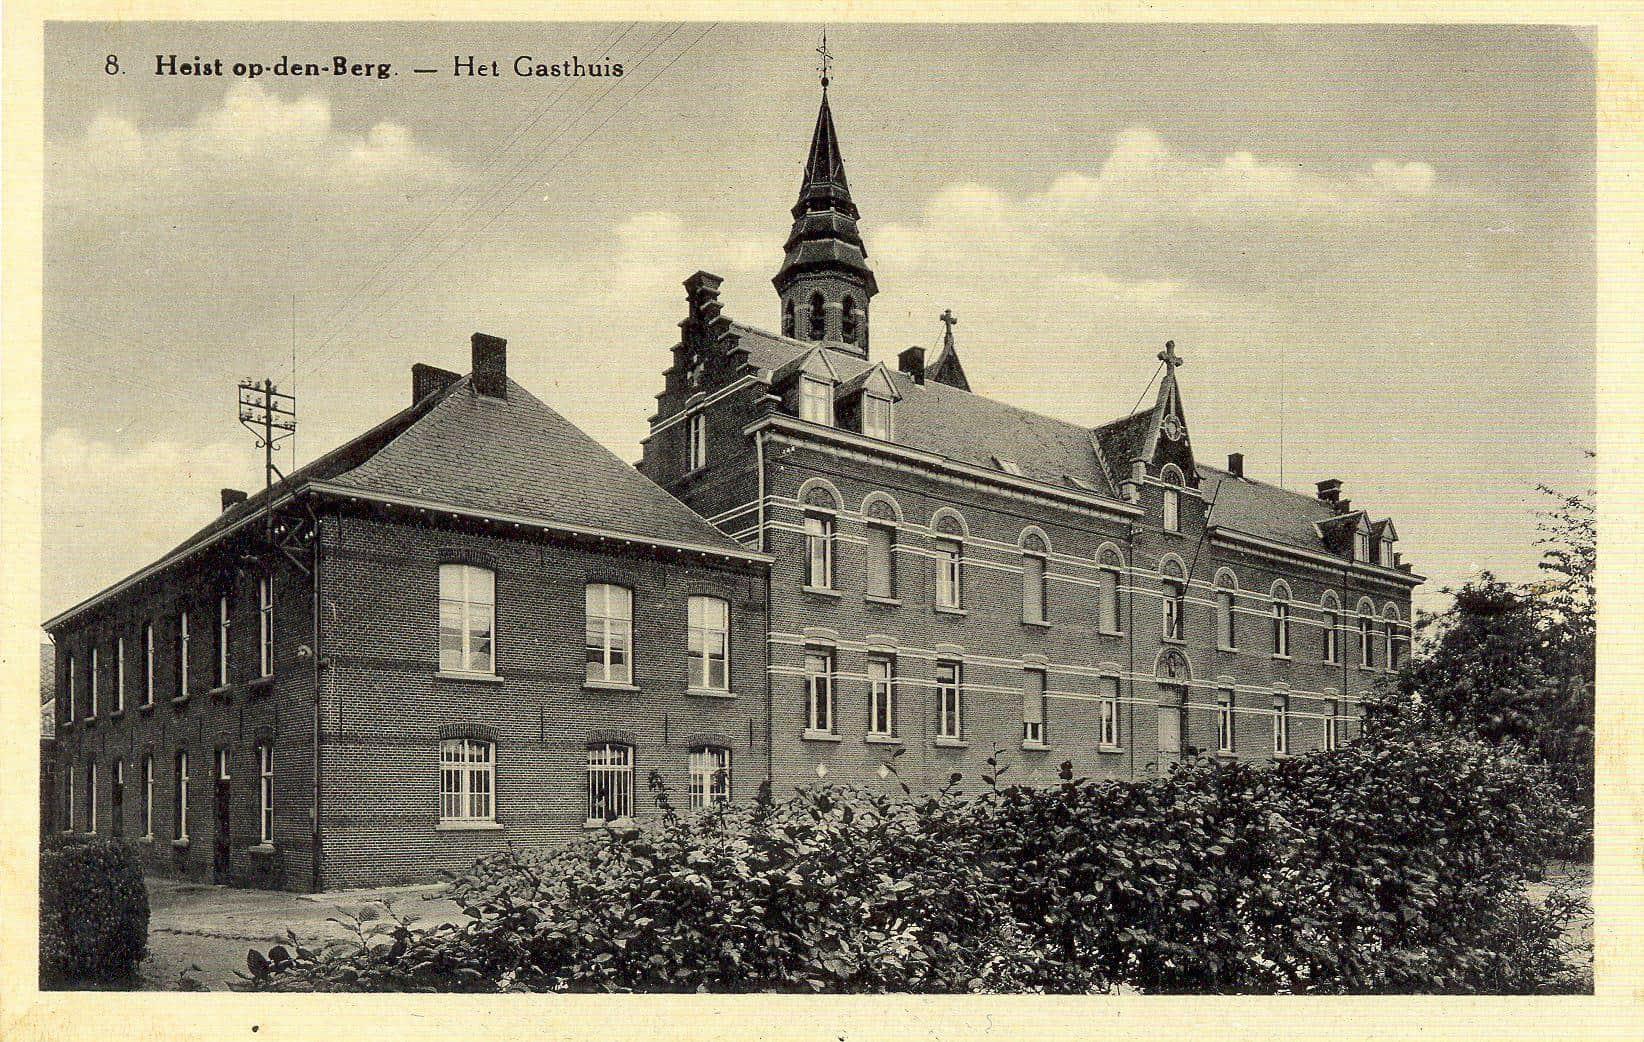 Klooster der Annonciaden – Kloosterstraat 1